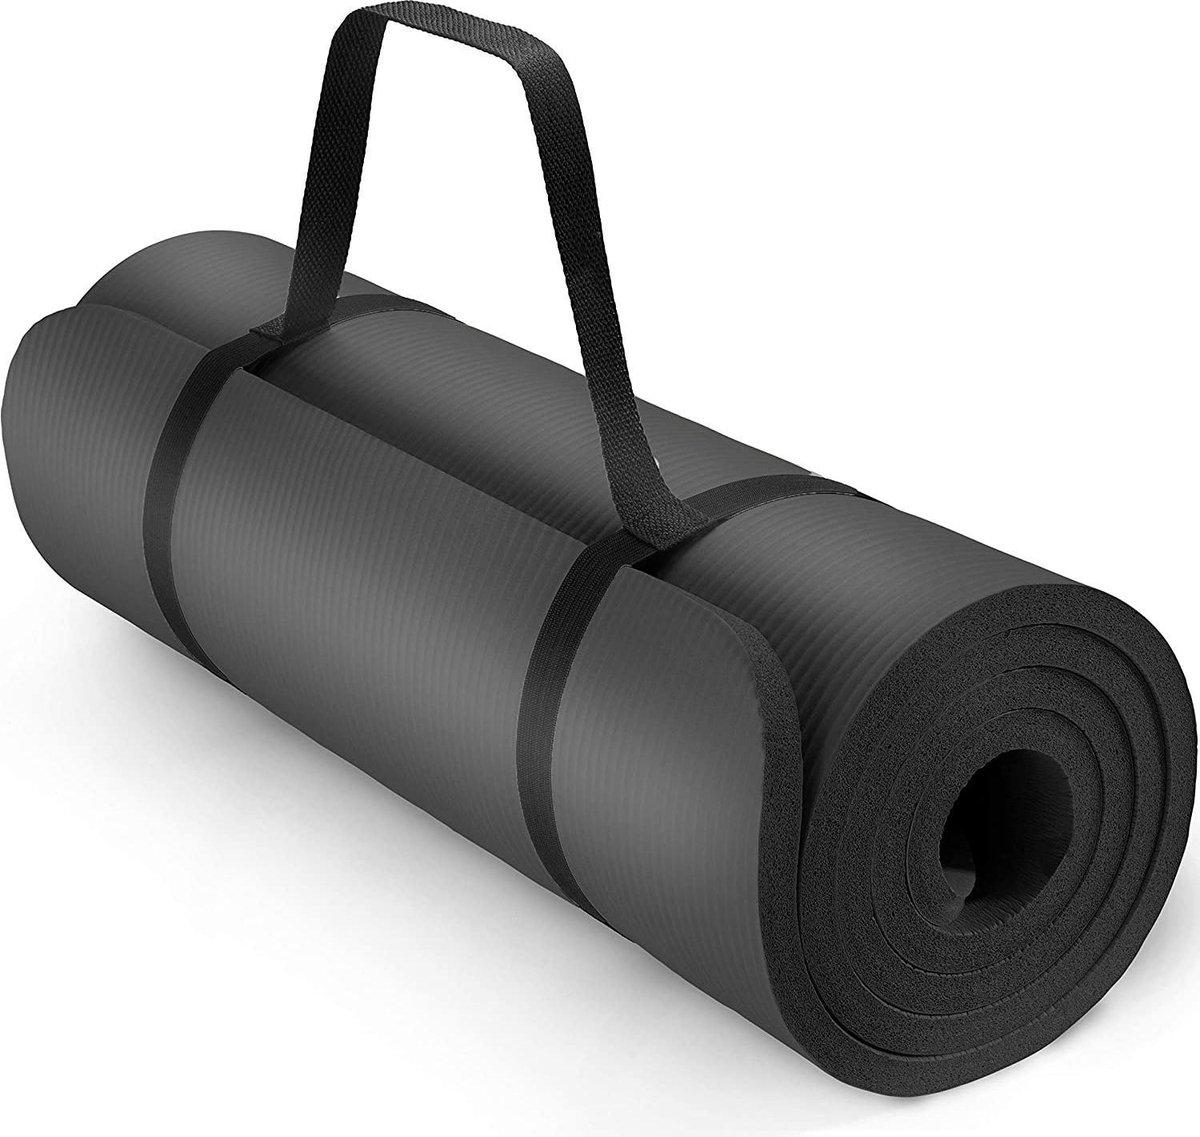 Yoga mat zwart 1 cm dik, fitnessmat, pilates, aerobics